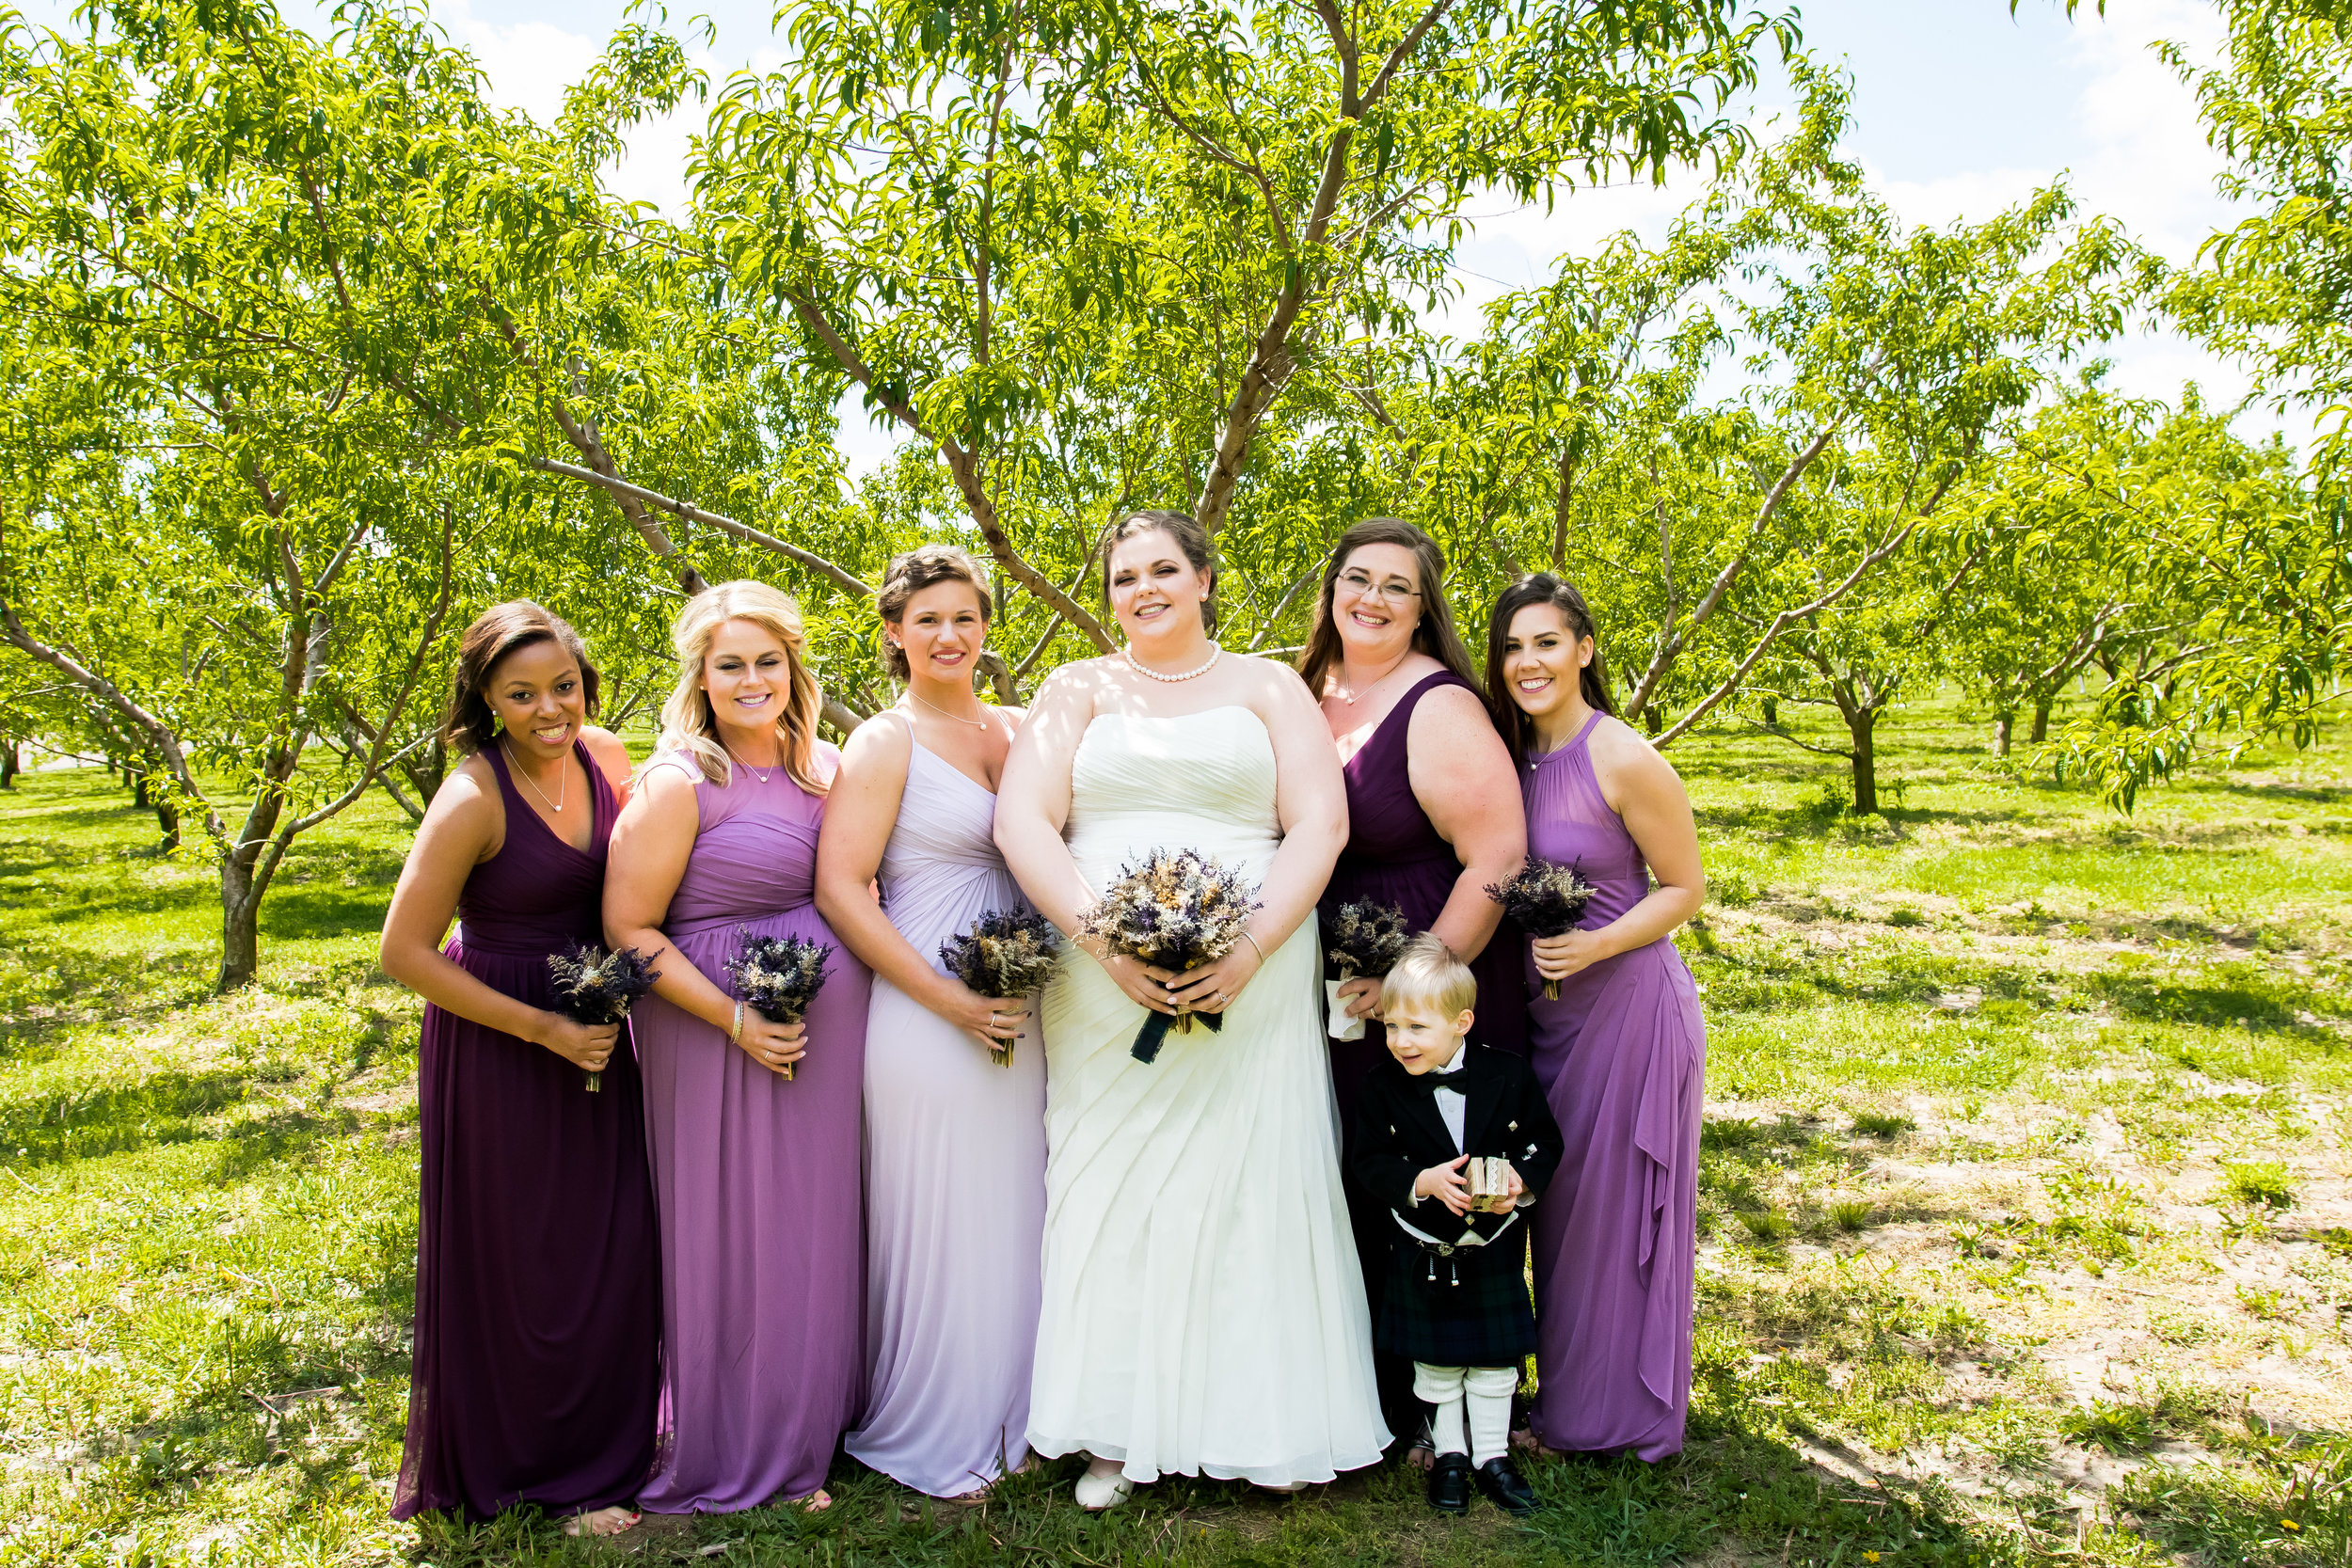 Indiana_Wedding_Photography_Zacharaiah-169.jpg